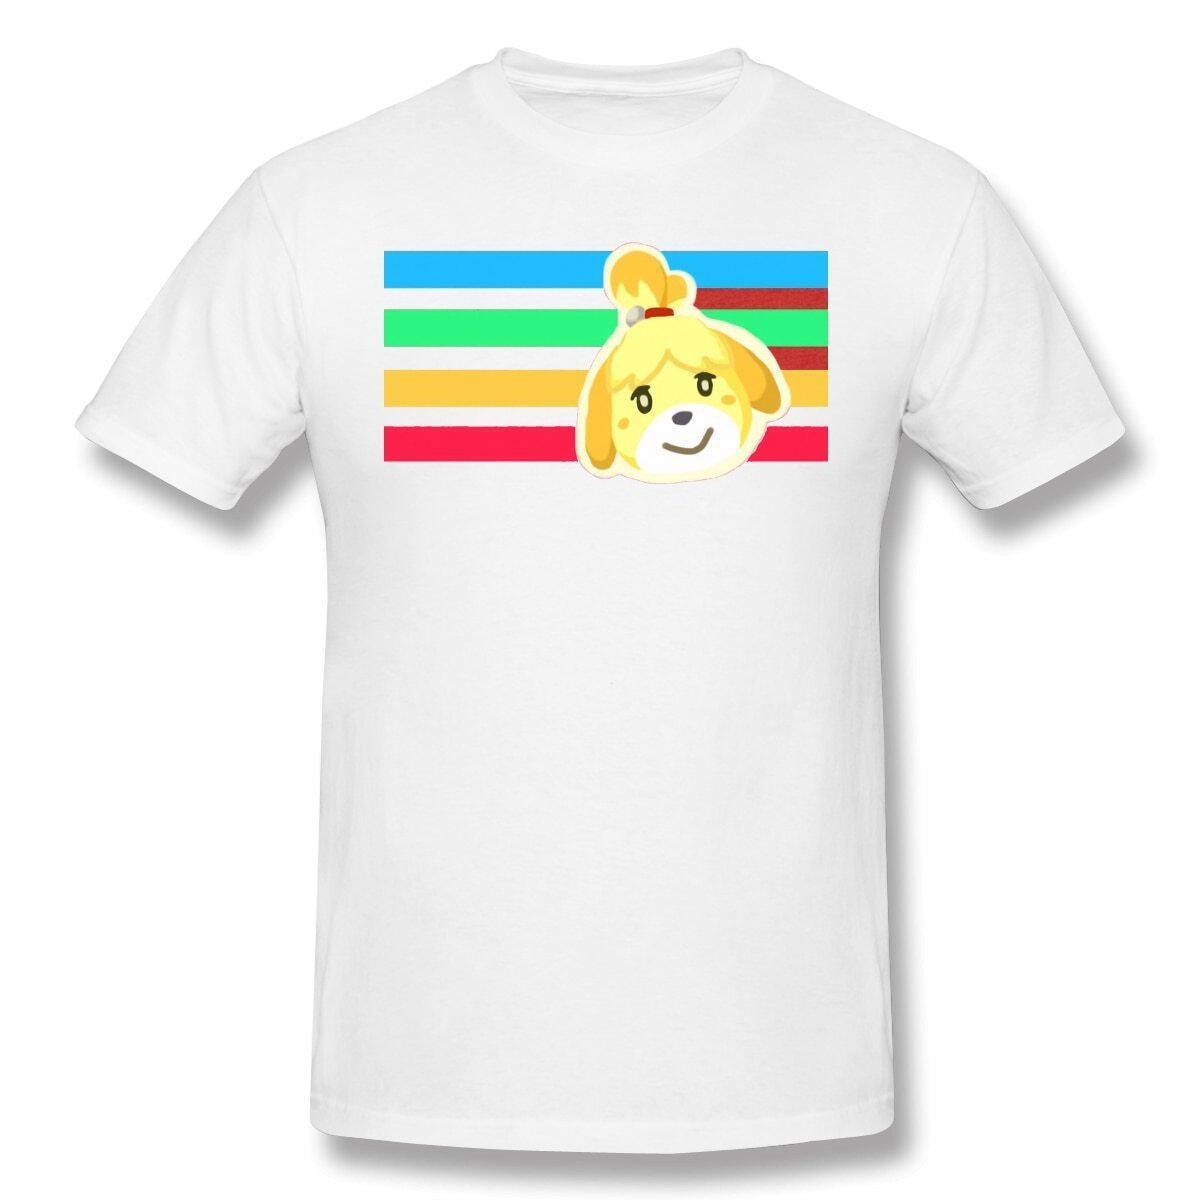 Animal Crossing Rainbow Isabelle 100% Cotton Shirt, White / XXXL